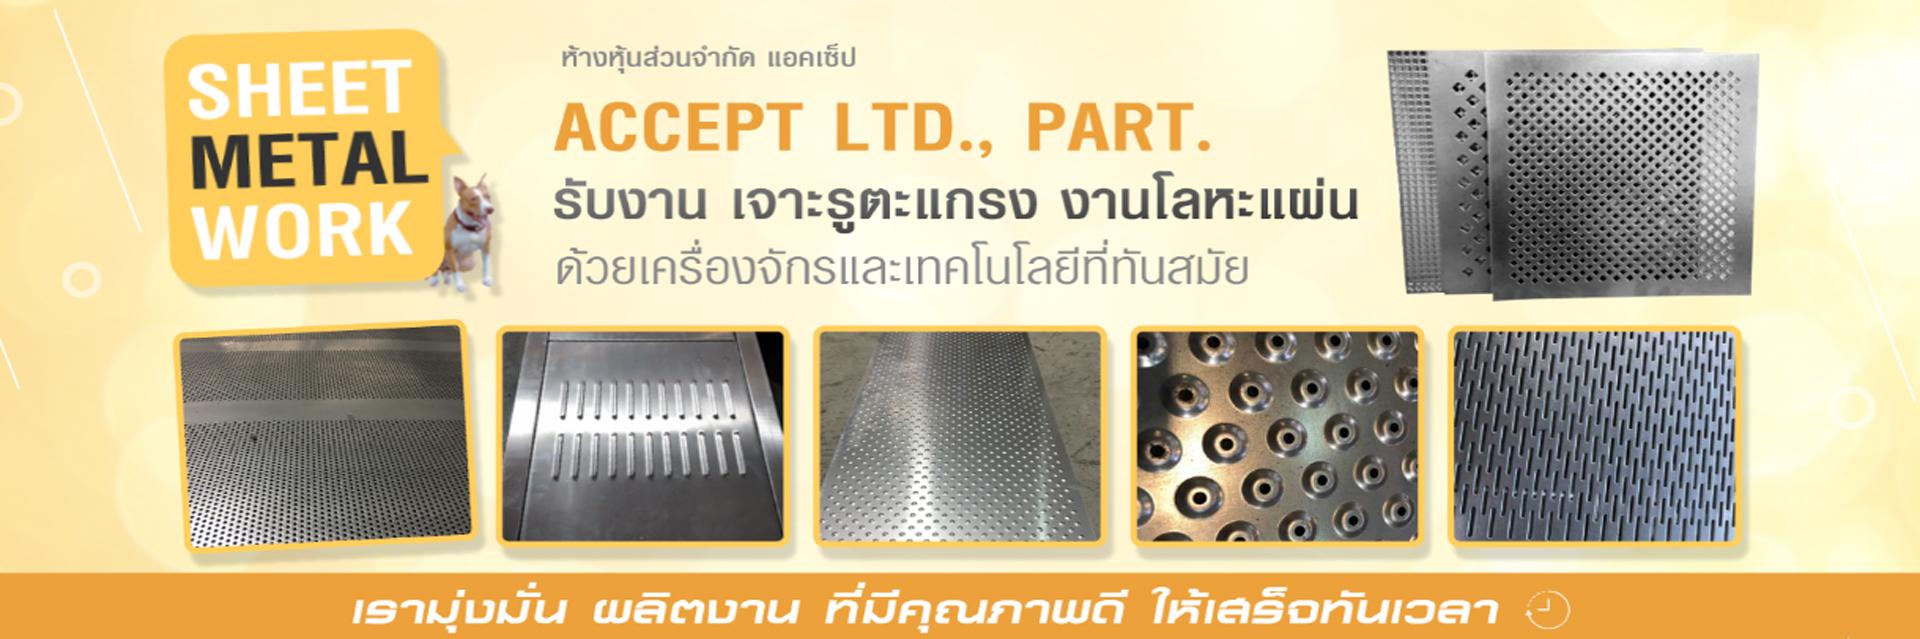 https://www.perforated-metalsheet.com/